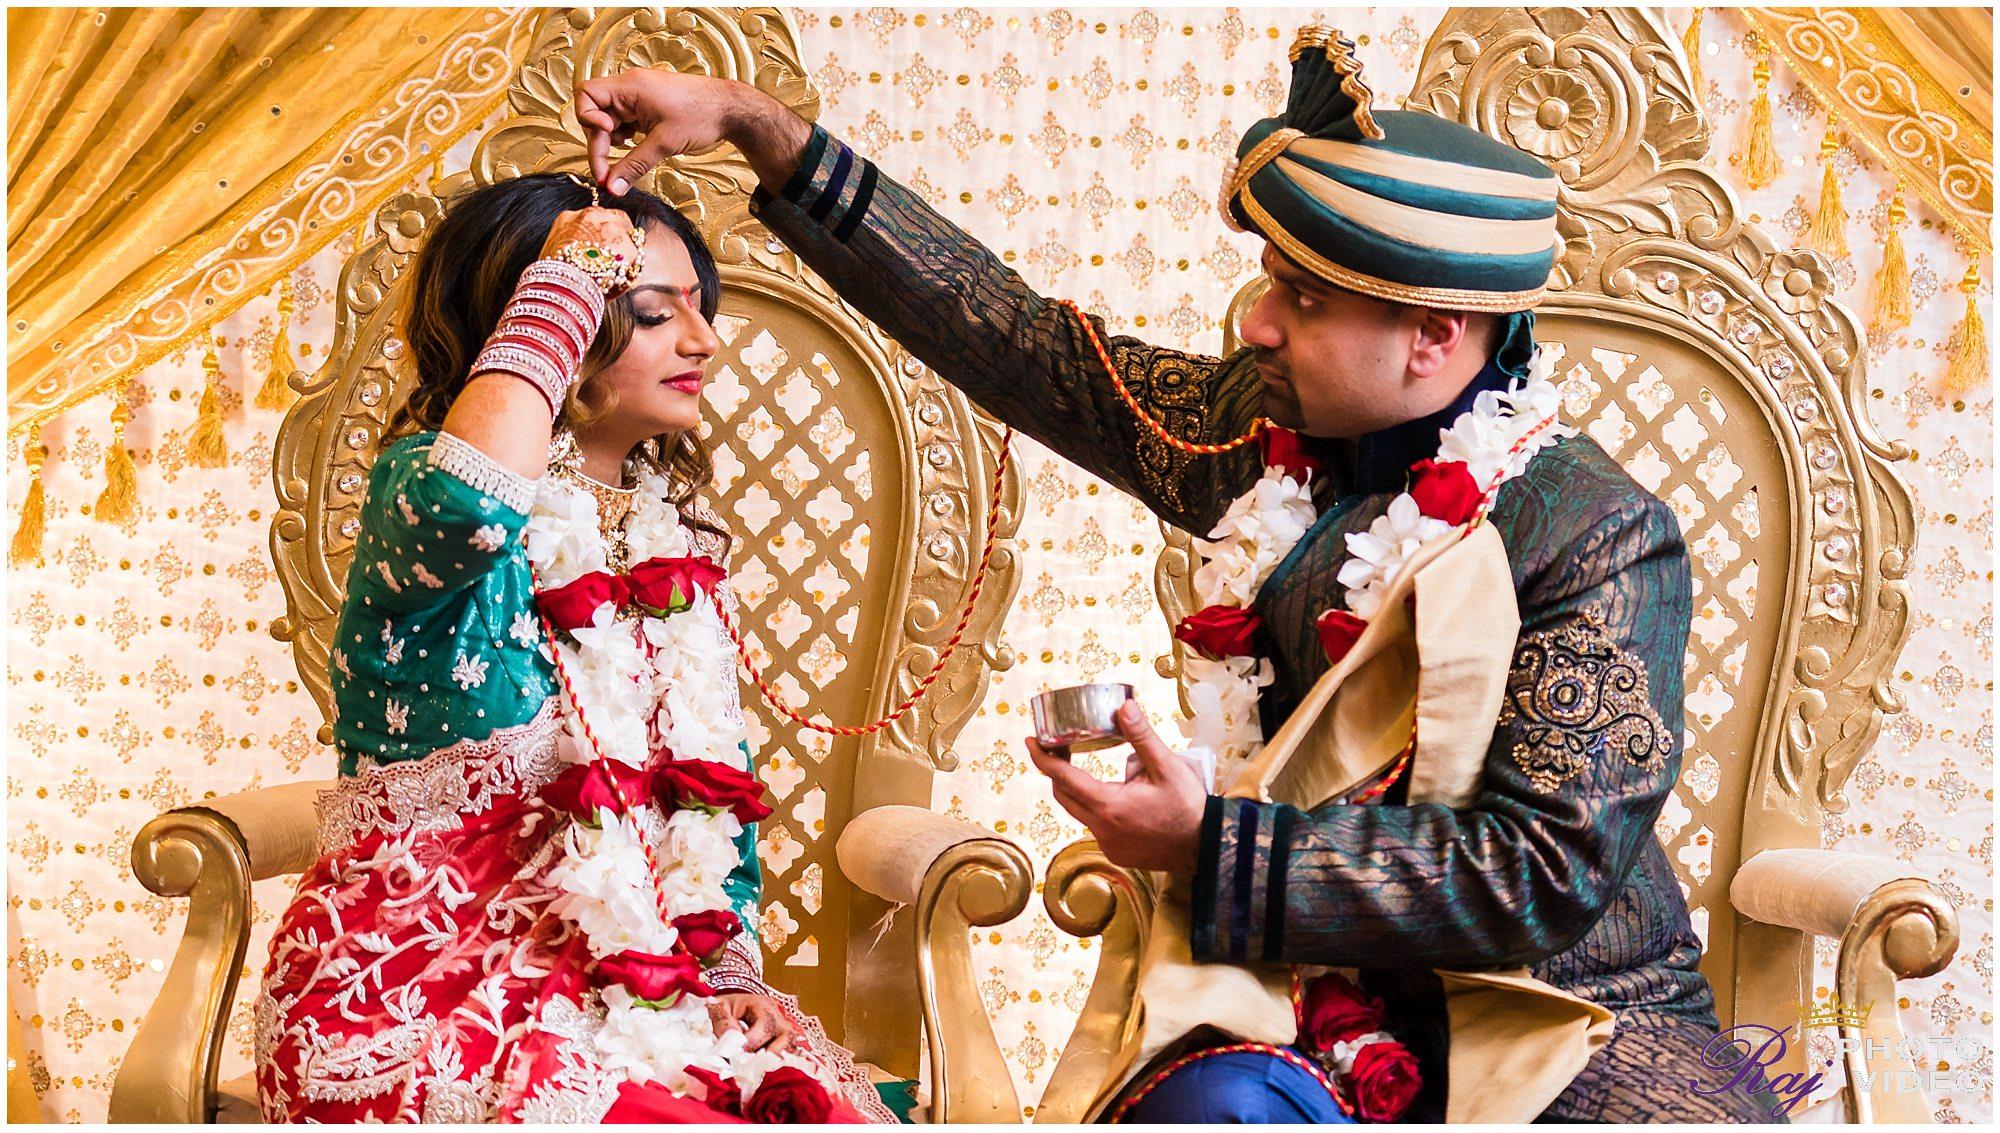 Sri-Guruvaayoorappan-Temple-Marlboro-NJ-Indian-Wedding-Chiyomi-Scott-00028.jpg